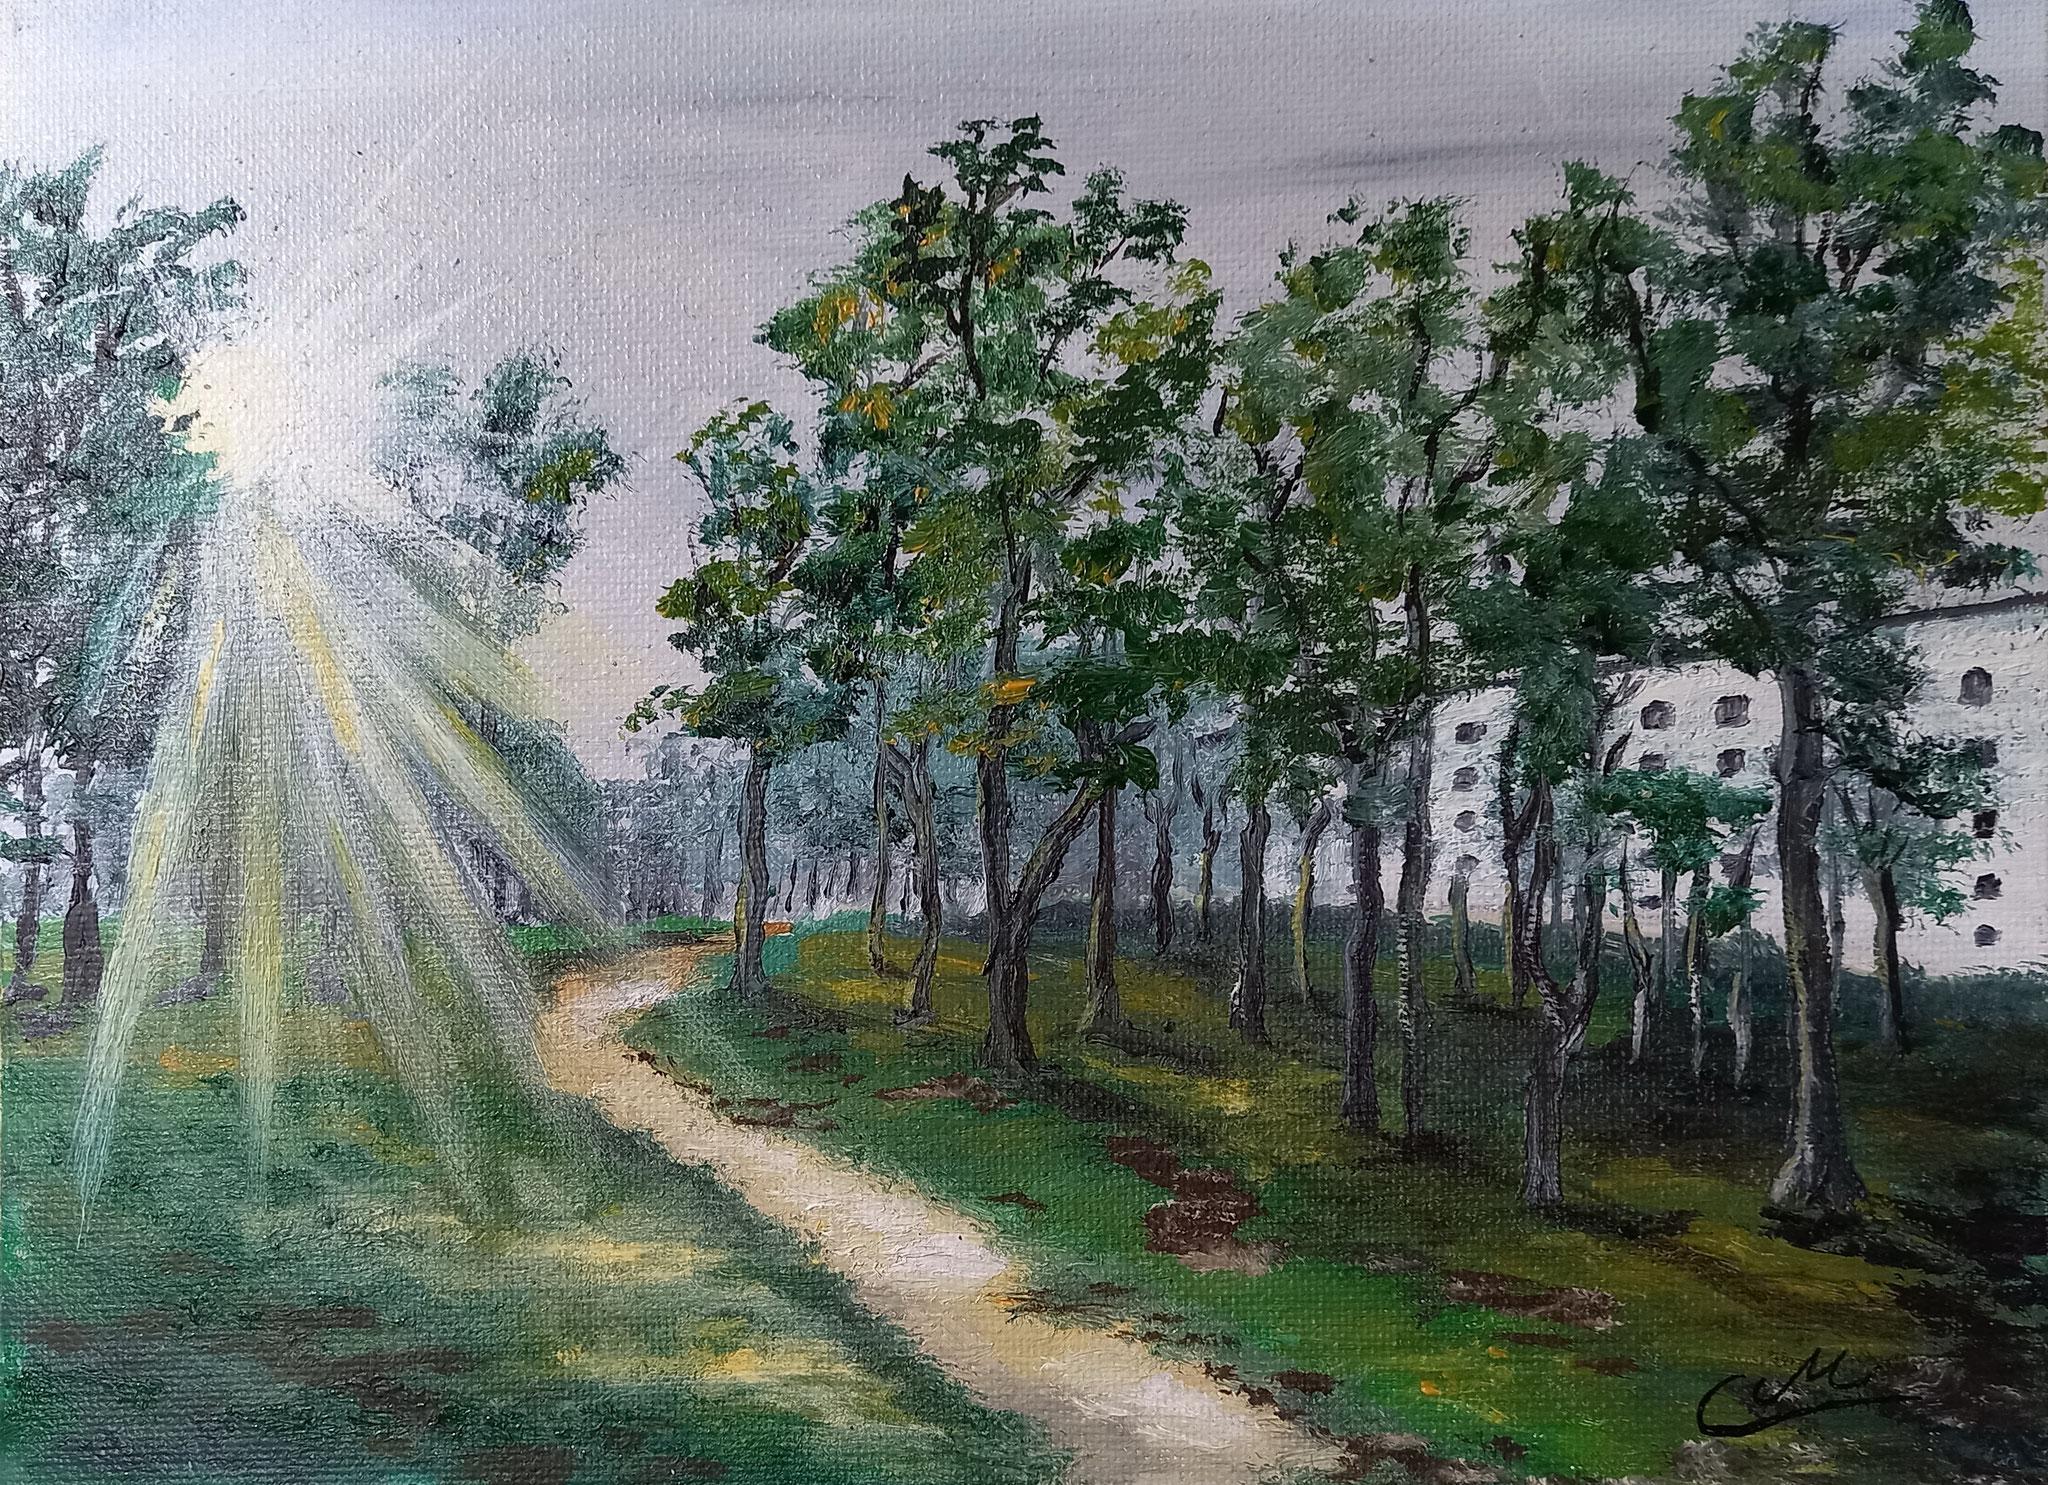 Proraer Heide